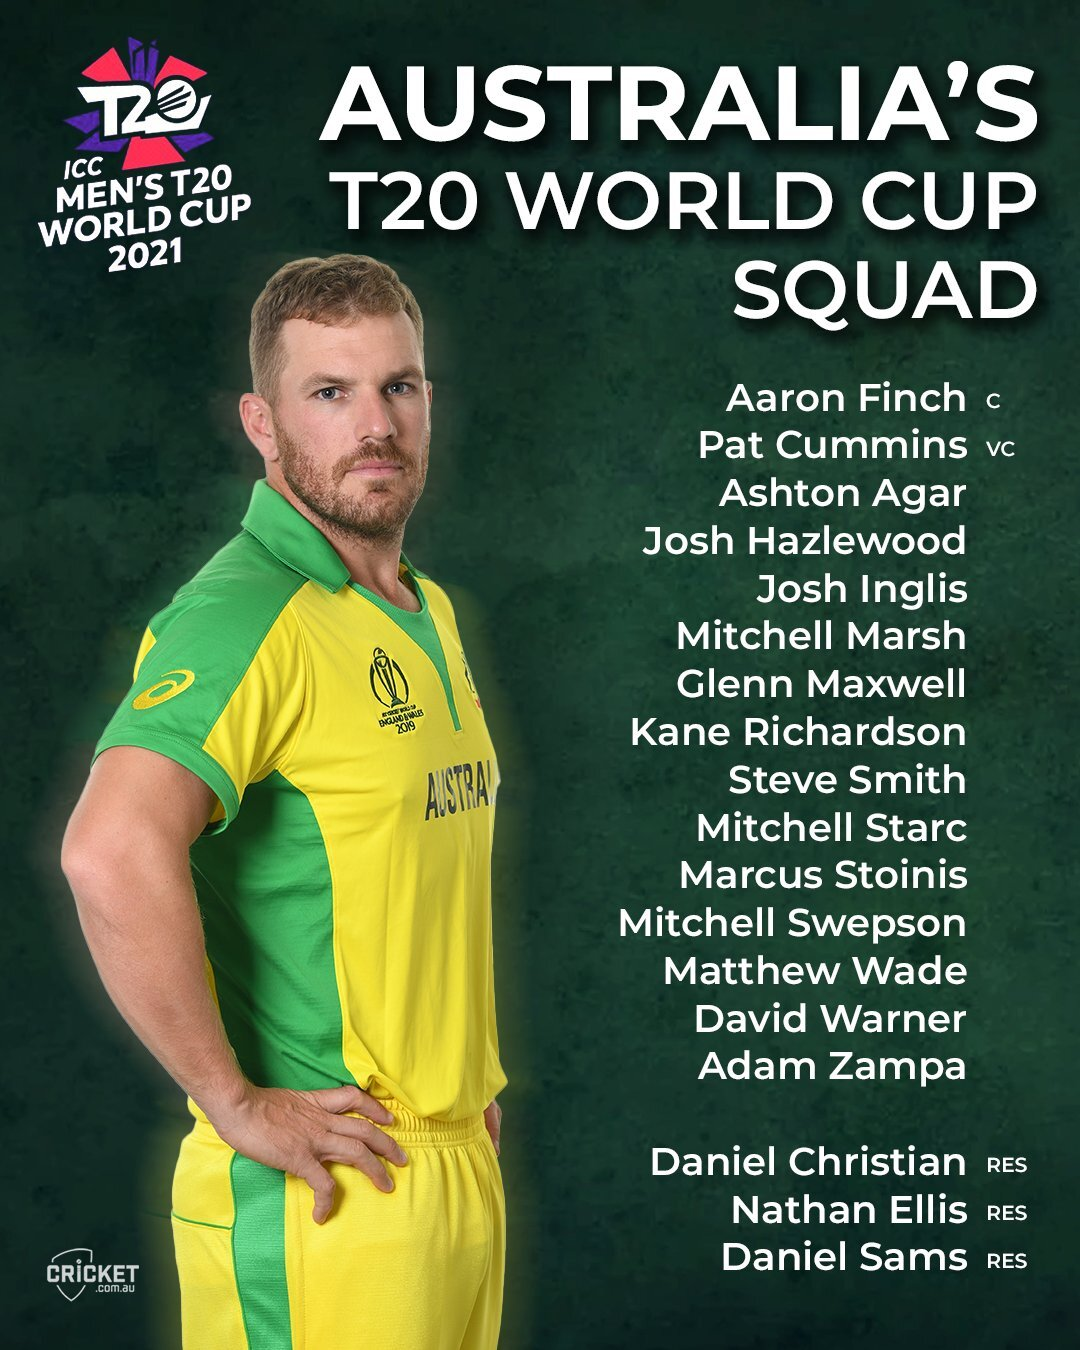 Australia Squad For ICC T20 World Cup 2021